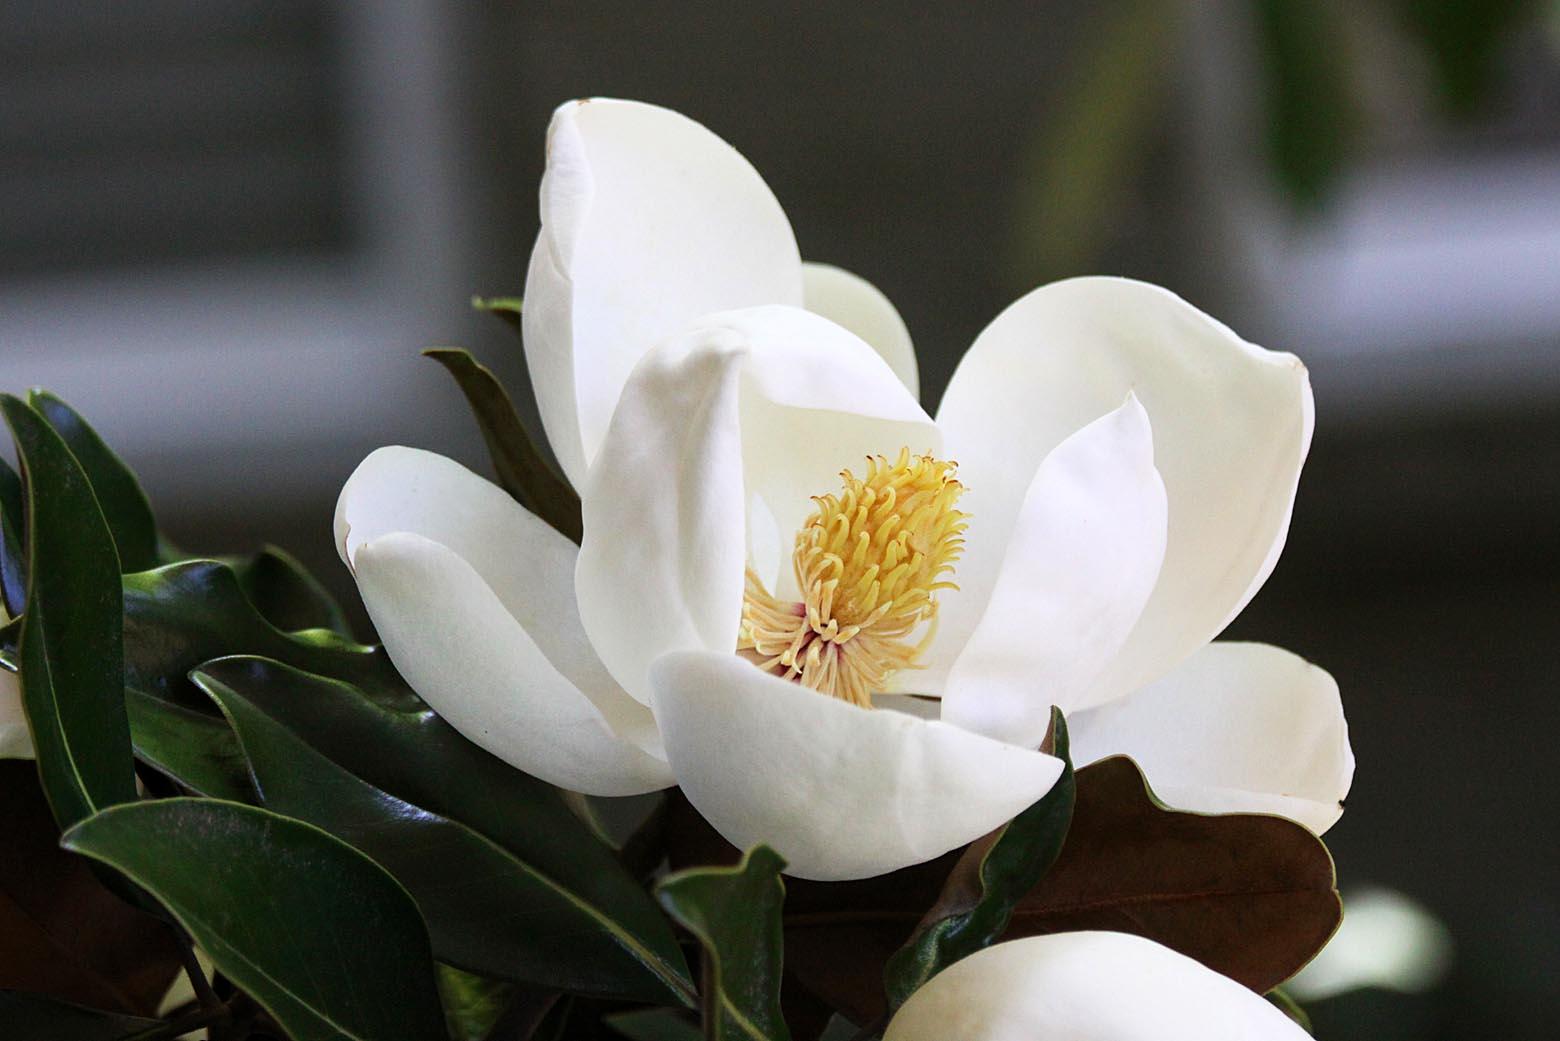 Southern Lagniappe: Sweet Magnolias